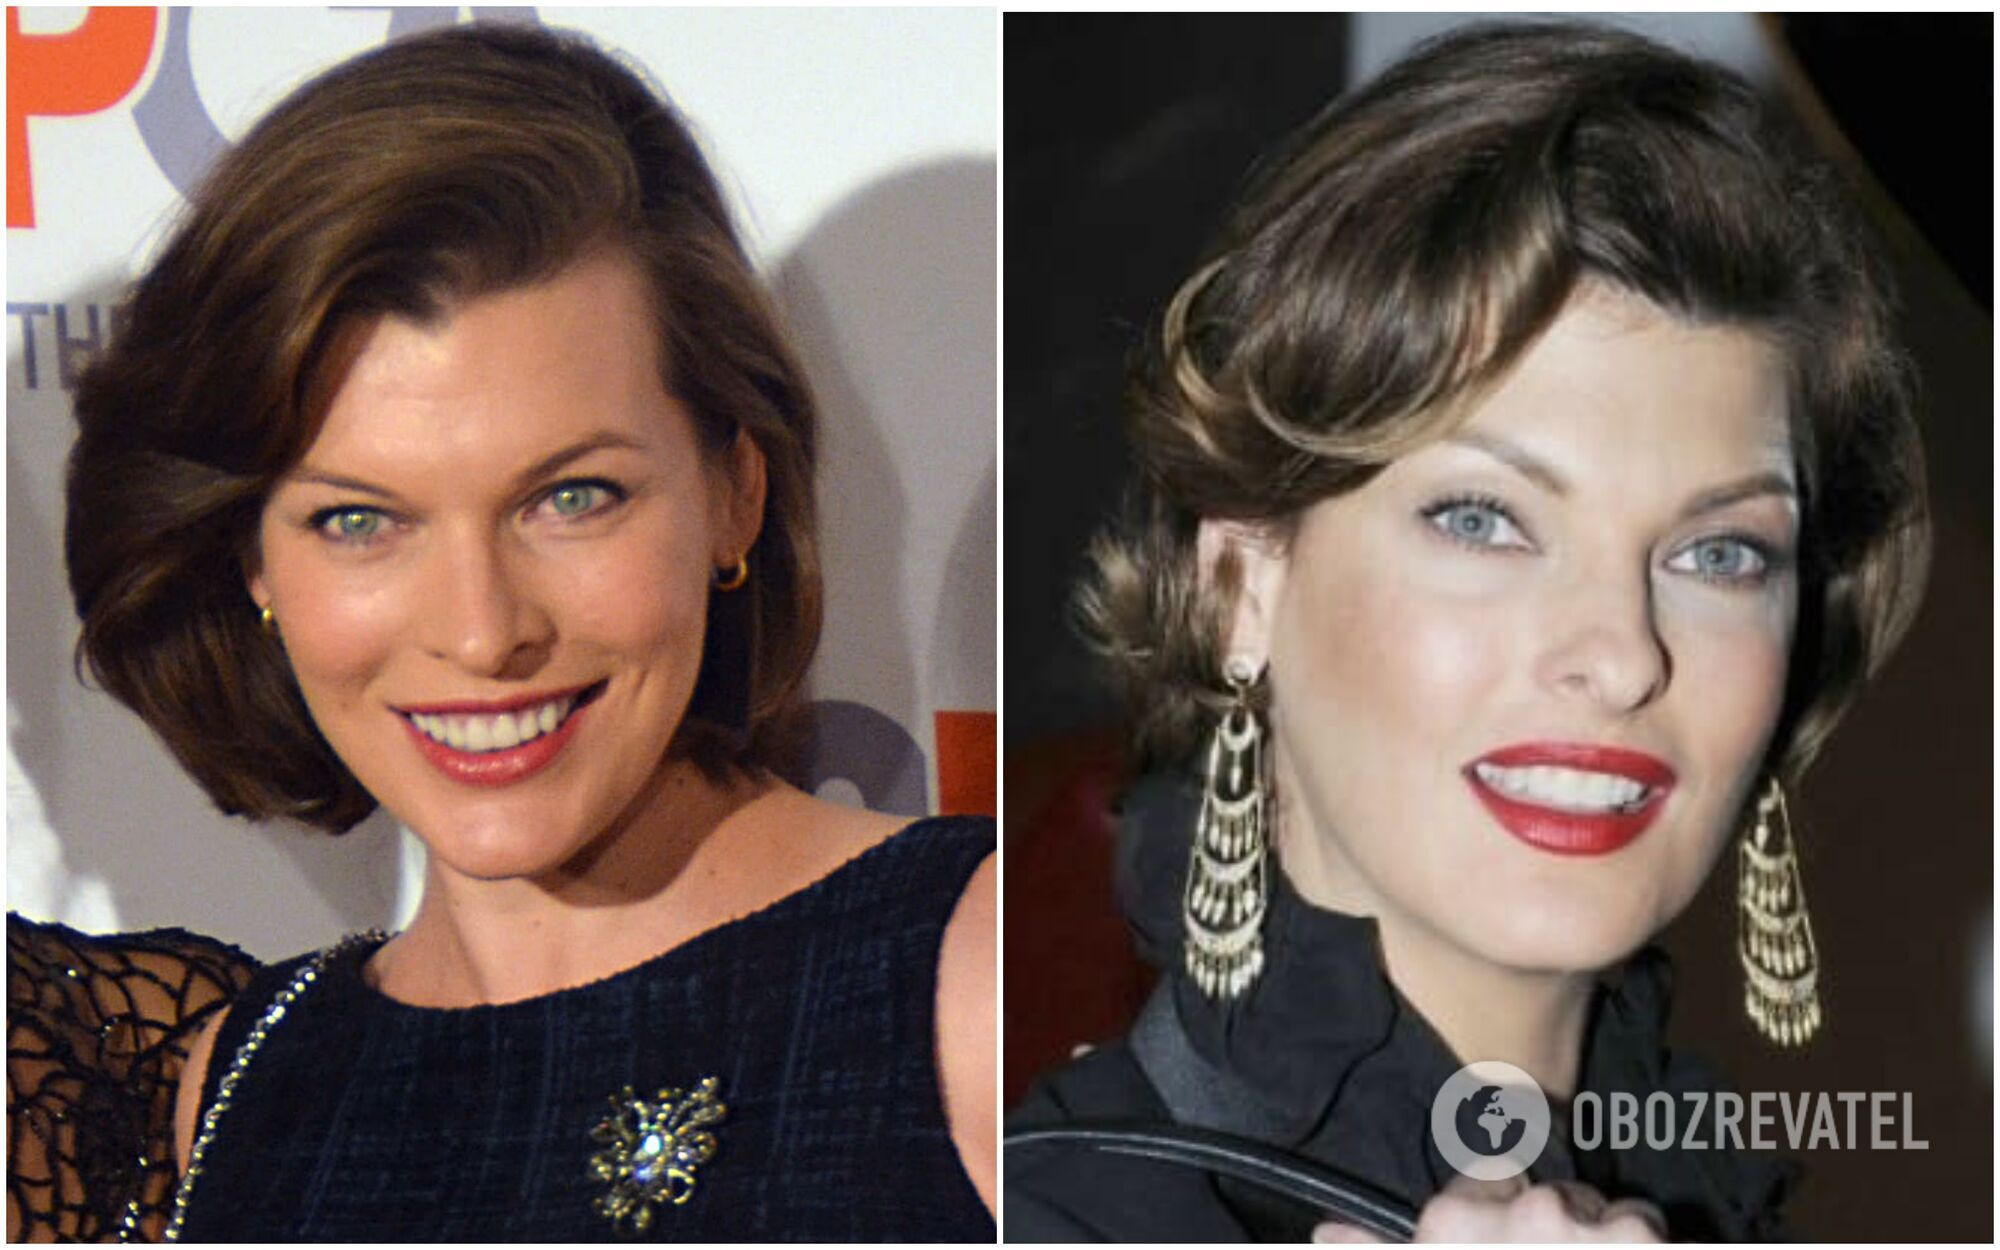 Милла Йовович и Линда Евангелиста выглядят как двойники